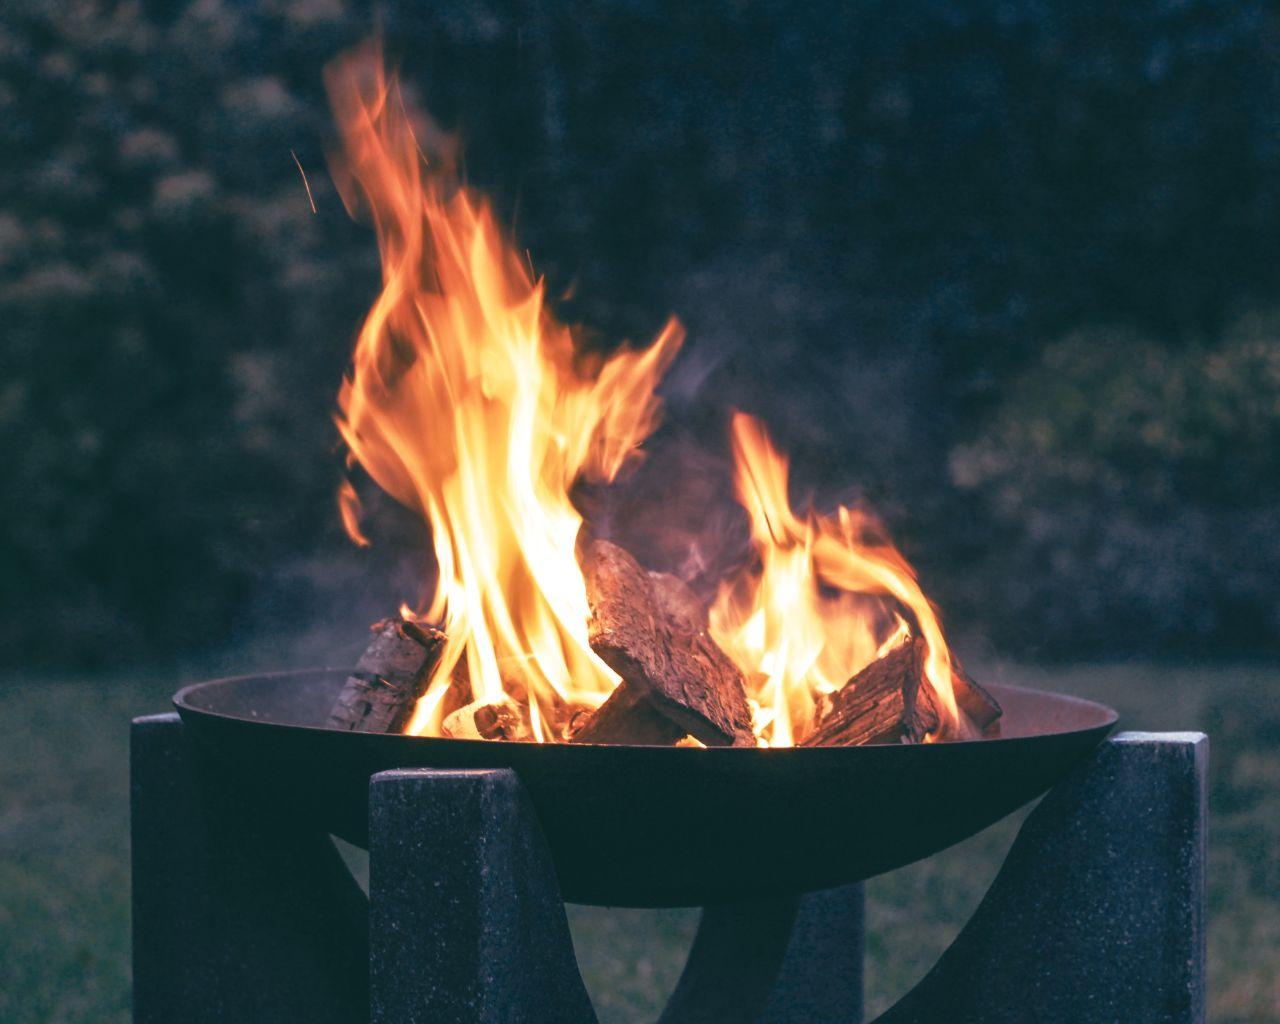 blaze-blur-bonfire-75253872 (1)